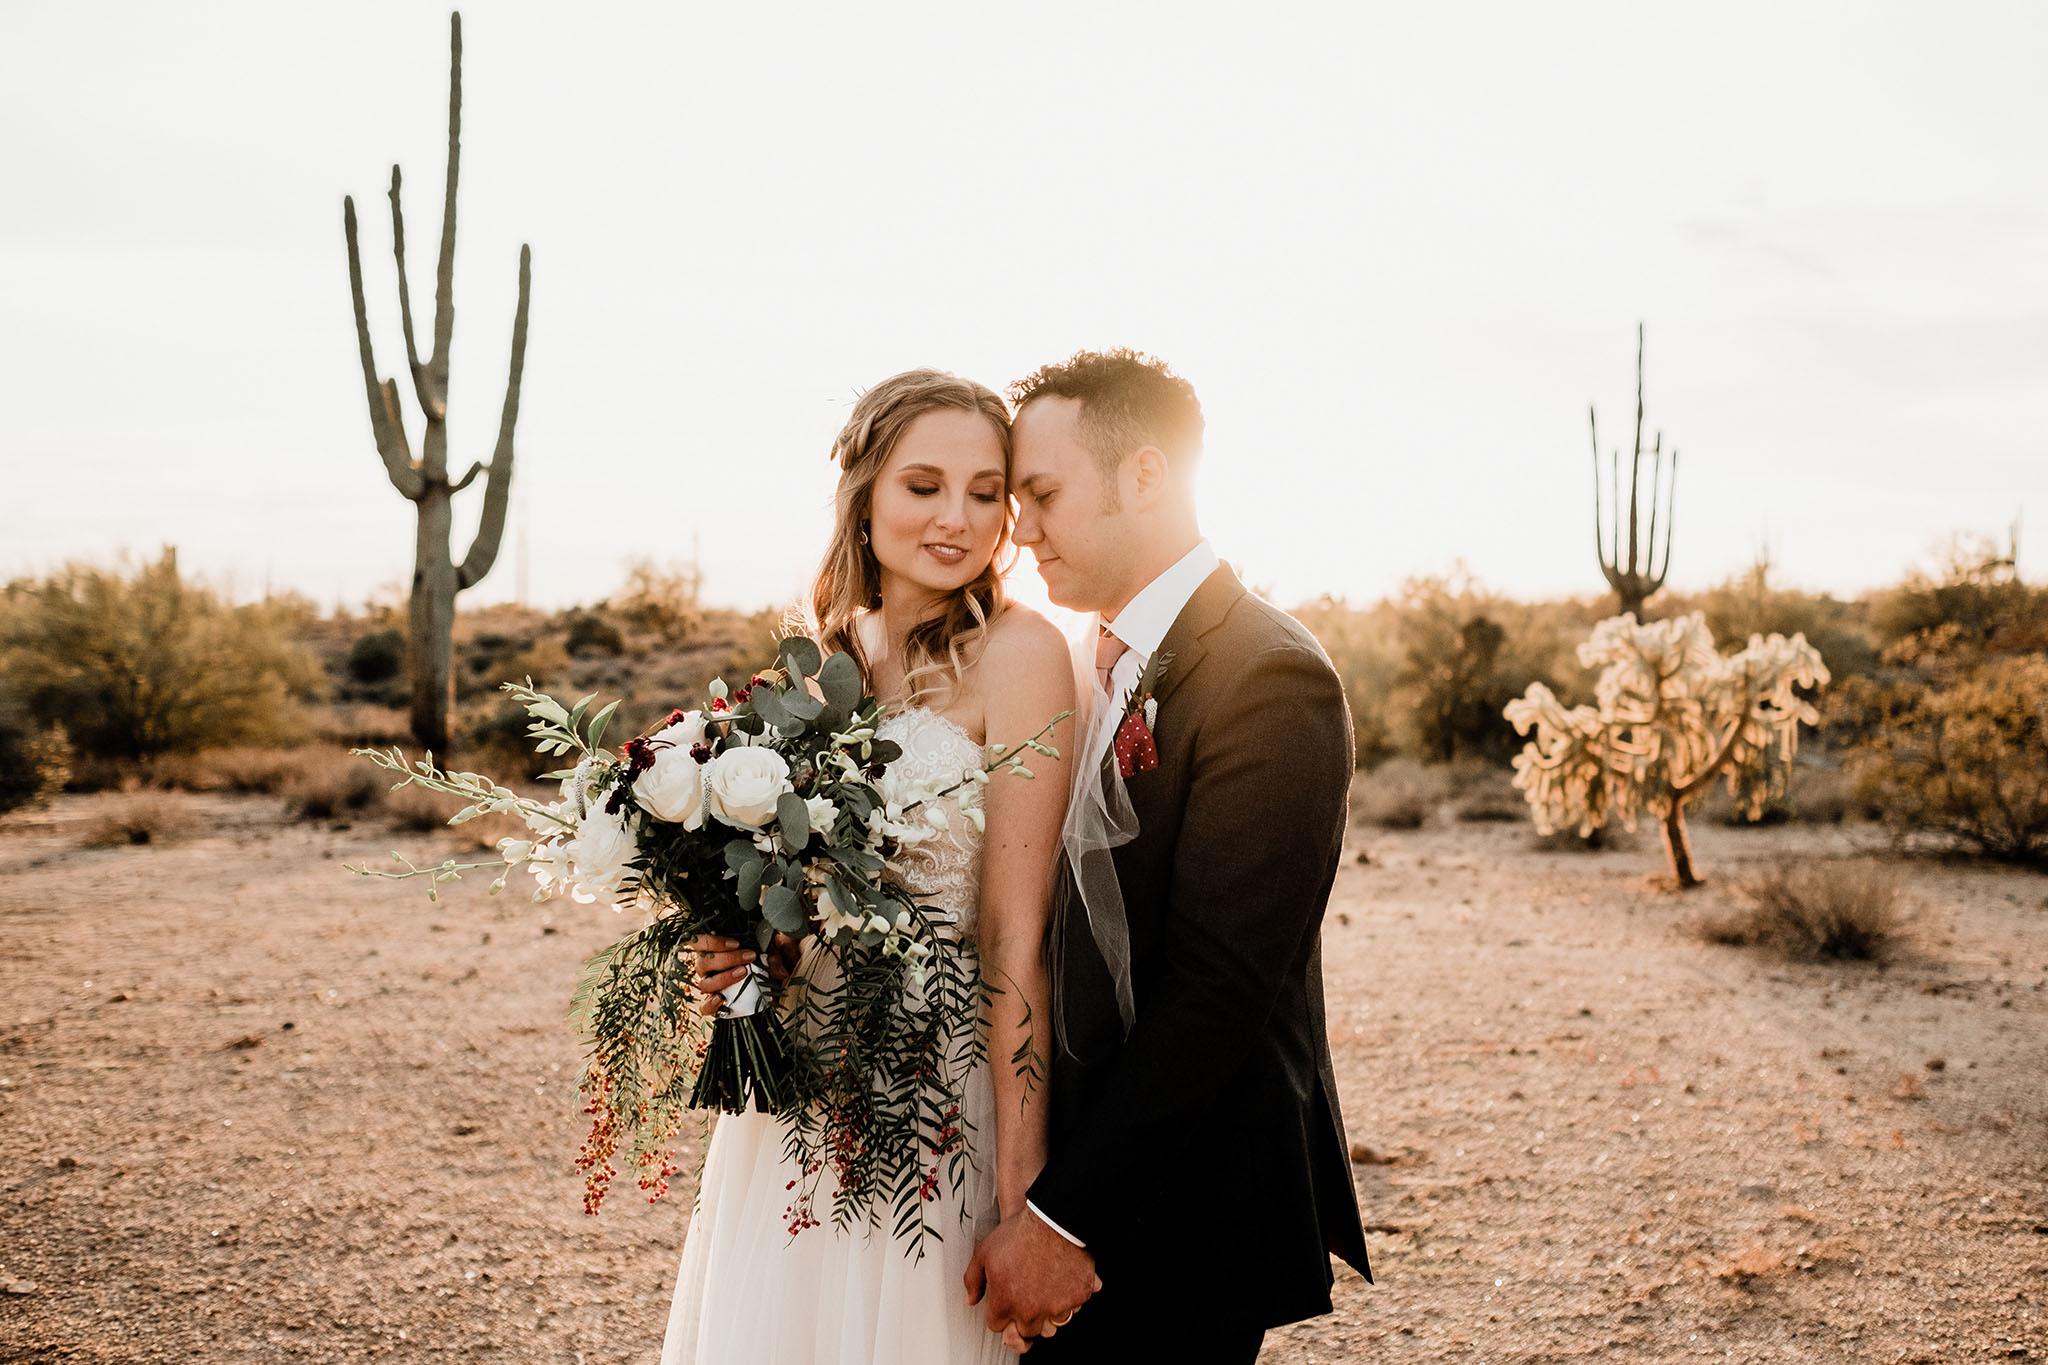 Arizona-Wedding-Photographer-The-Paseo-Venue31.jpg